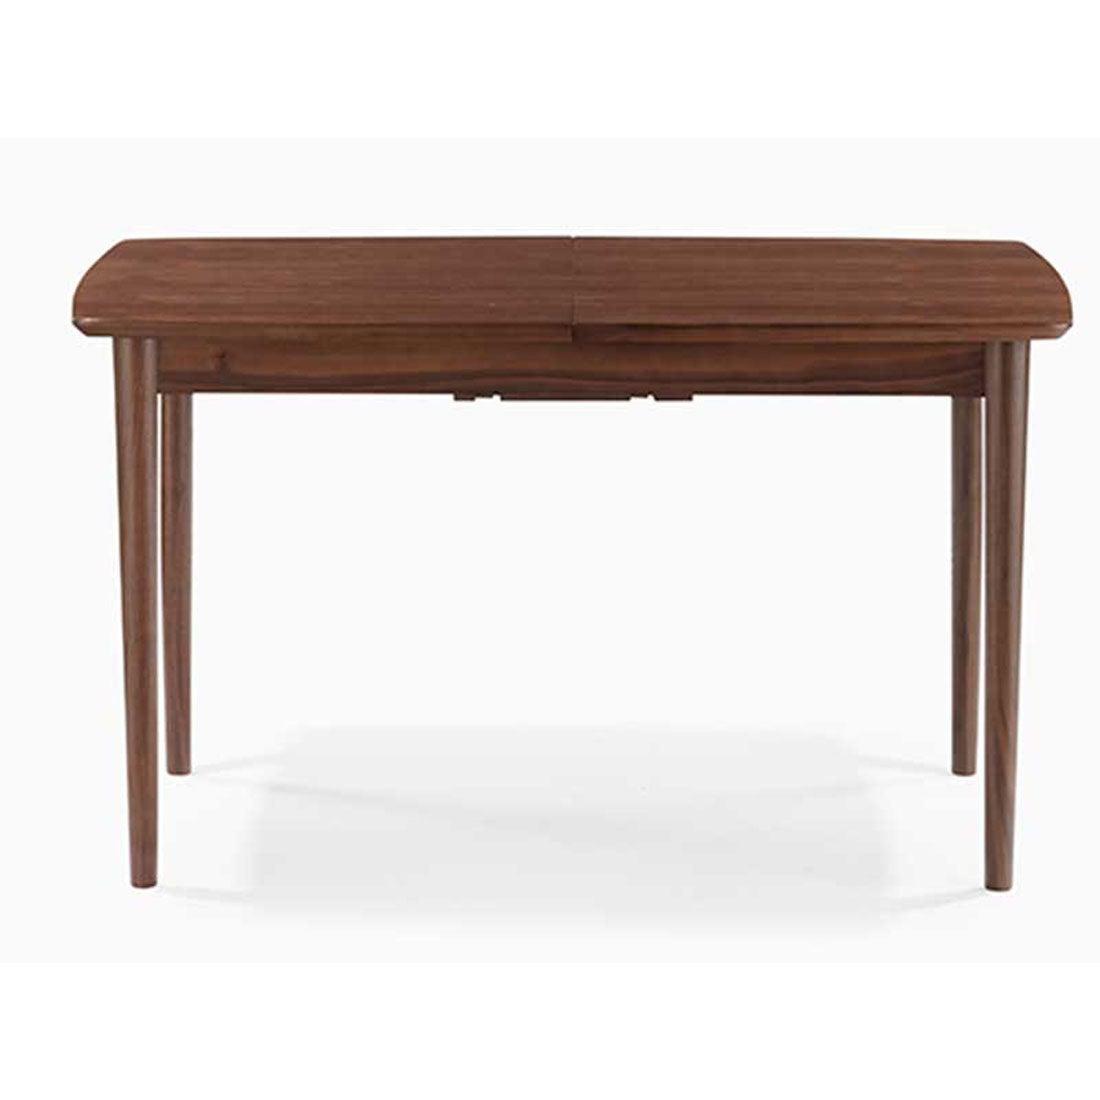 IDC OTSUKA/大塚家具 ダイニングテーブル(伸長式) ウイング WN 1250タイプ (ウォールナット)【返品不可商品】